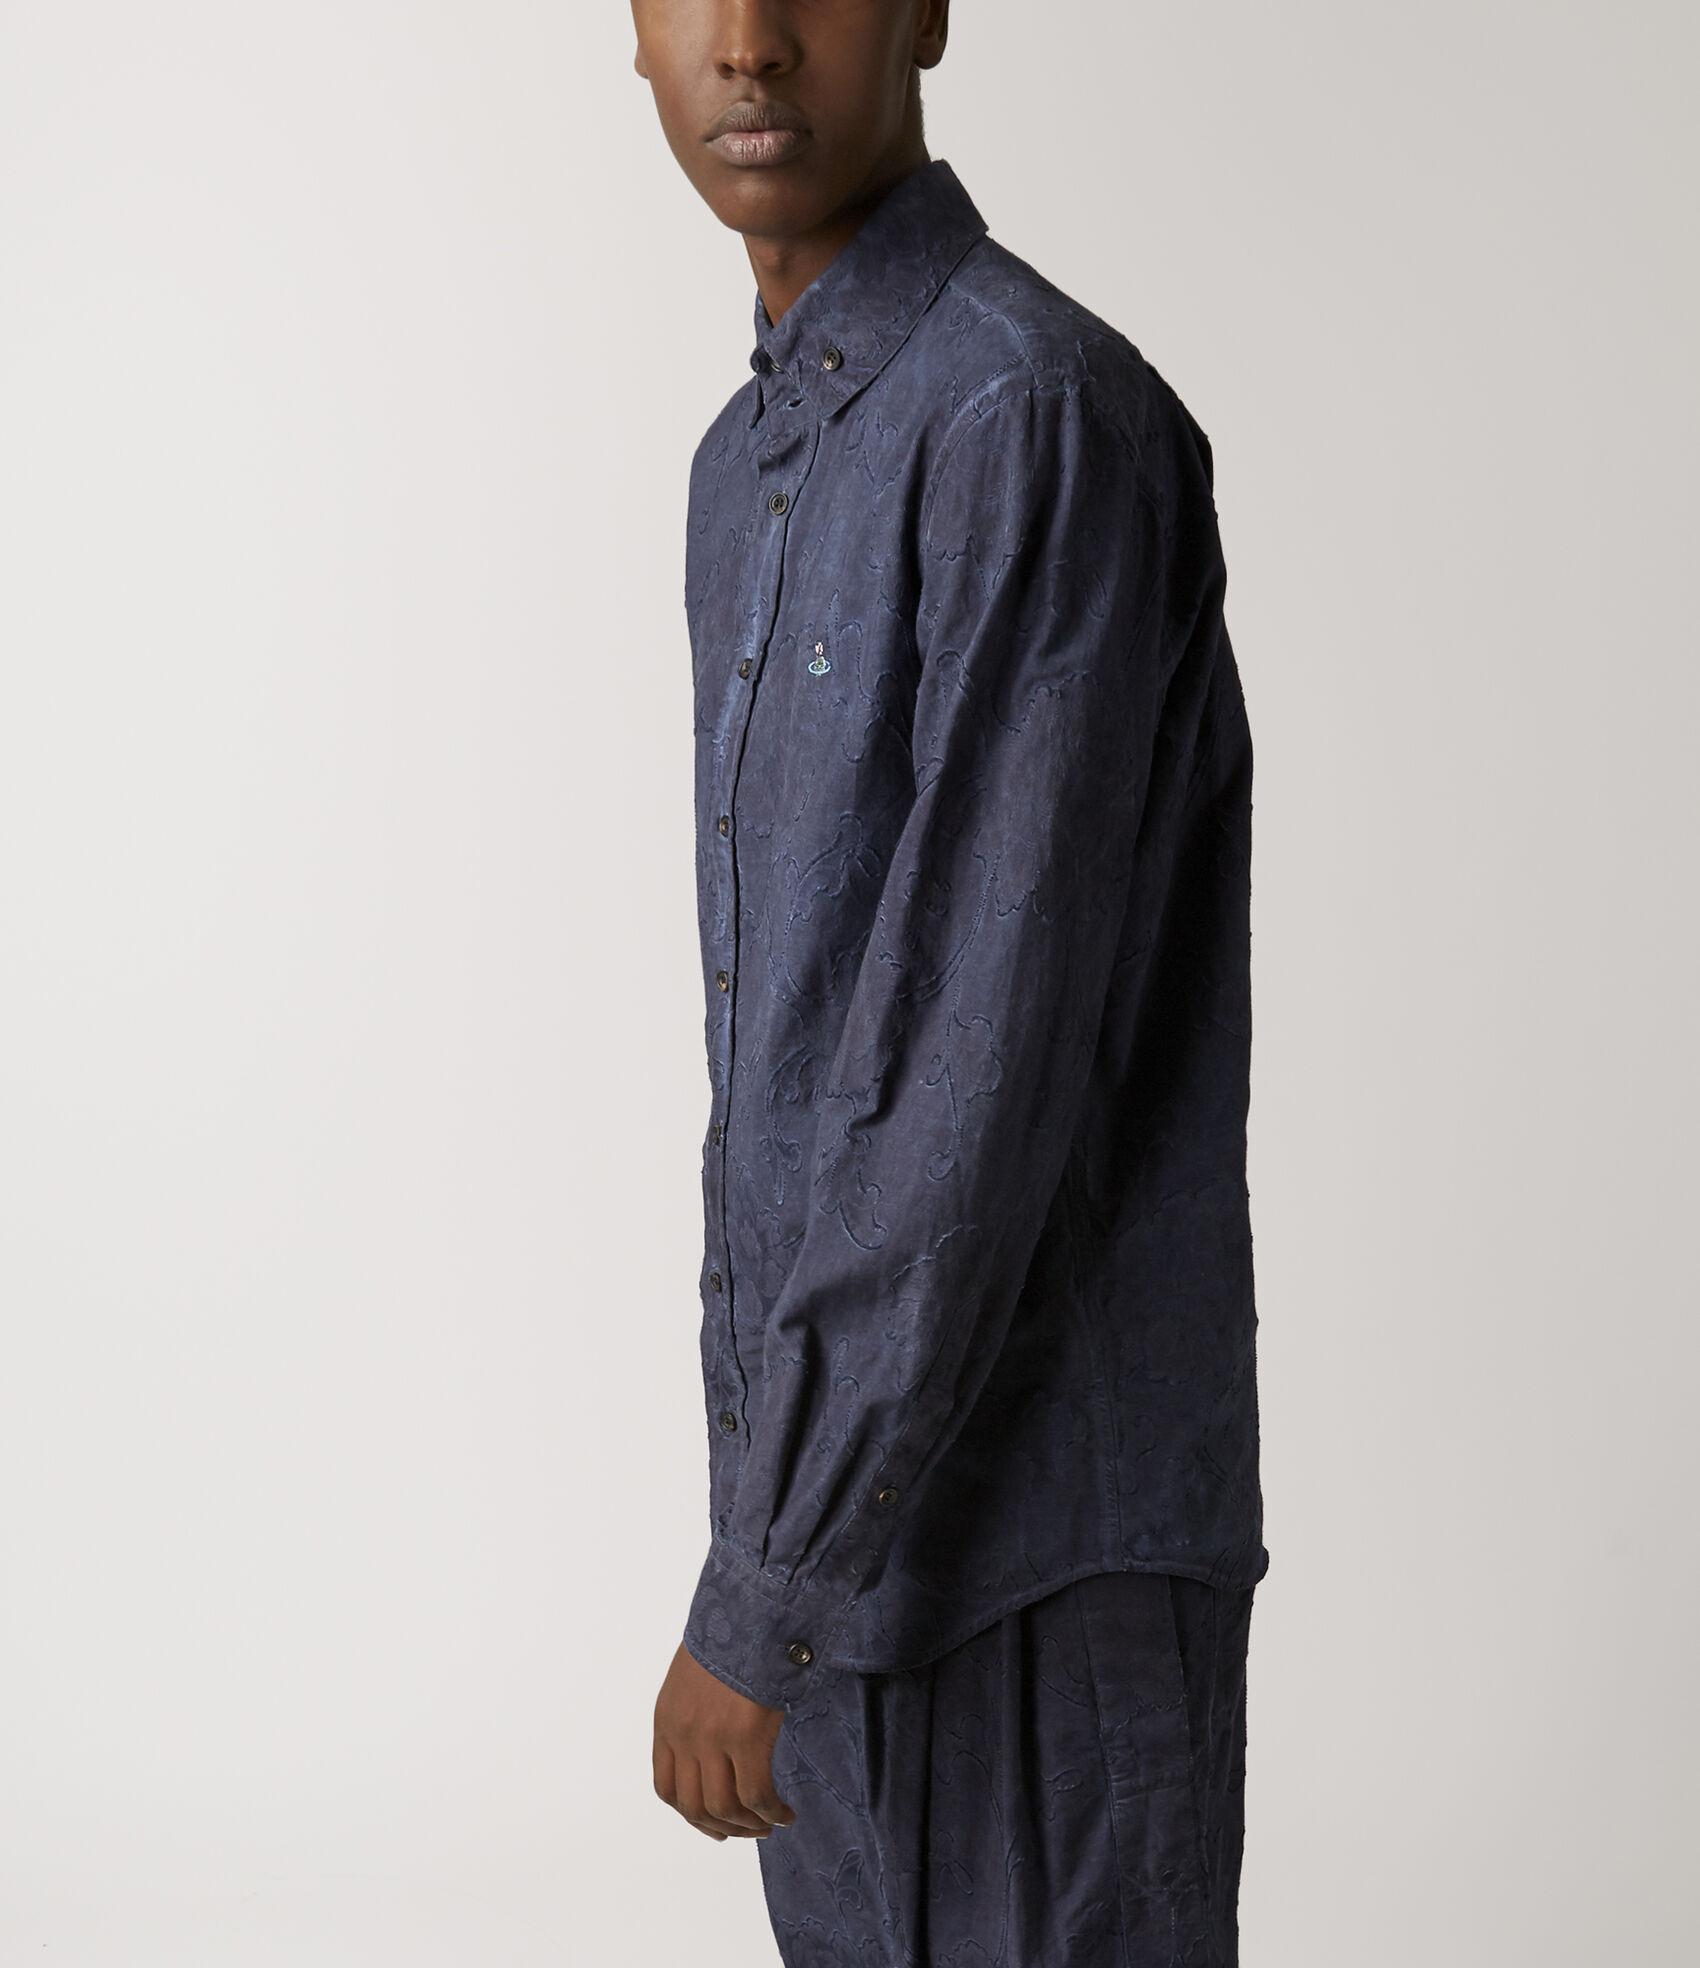 16e370b8aa5 Vivienne Westwood Men s Designer Shirts